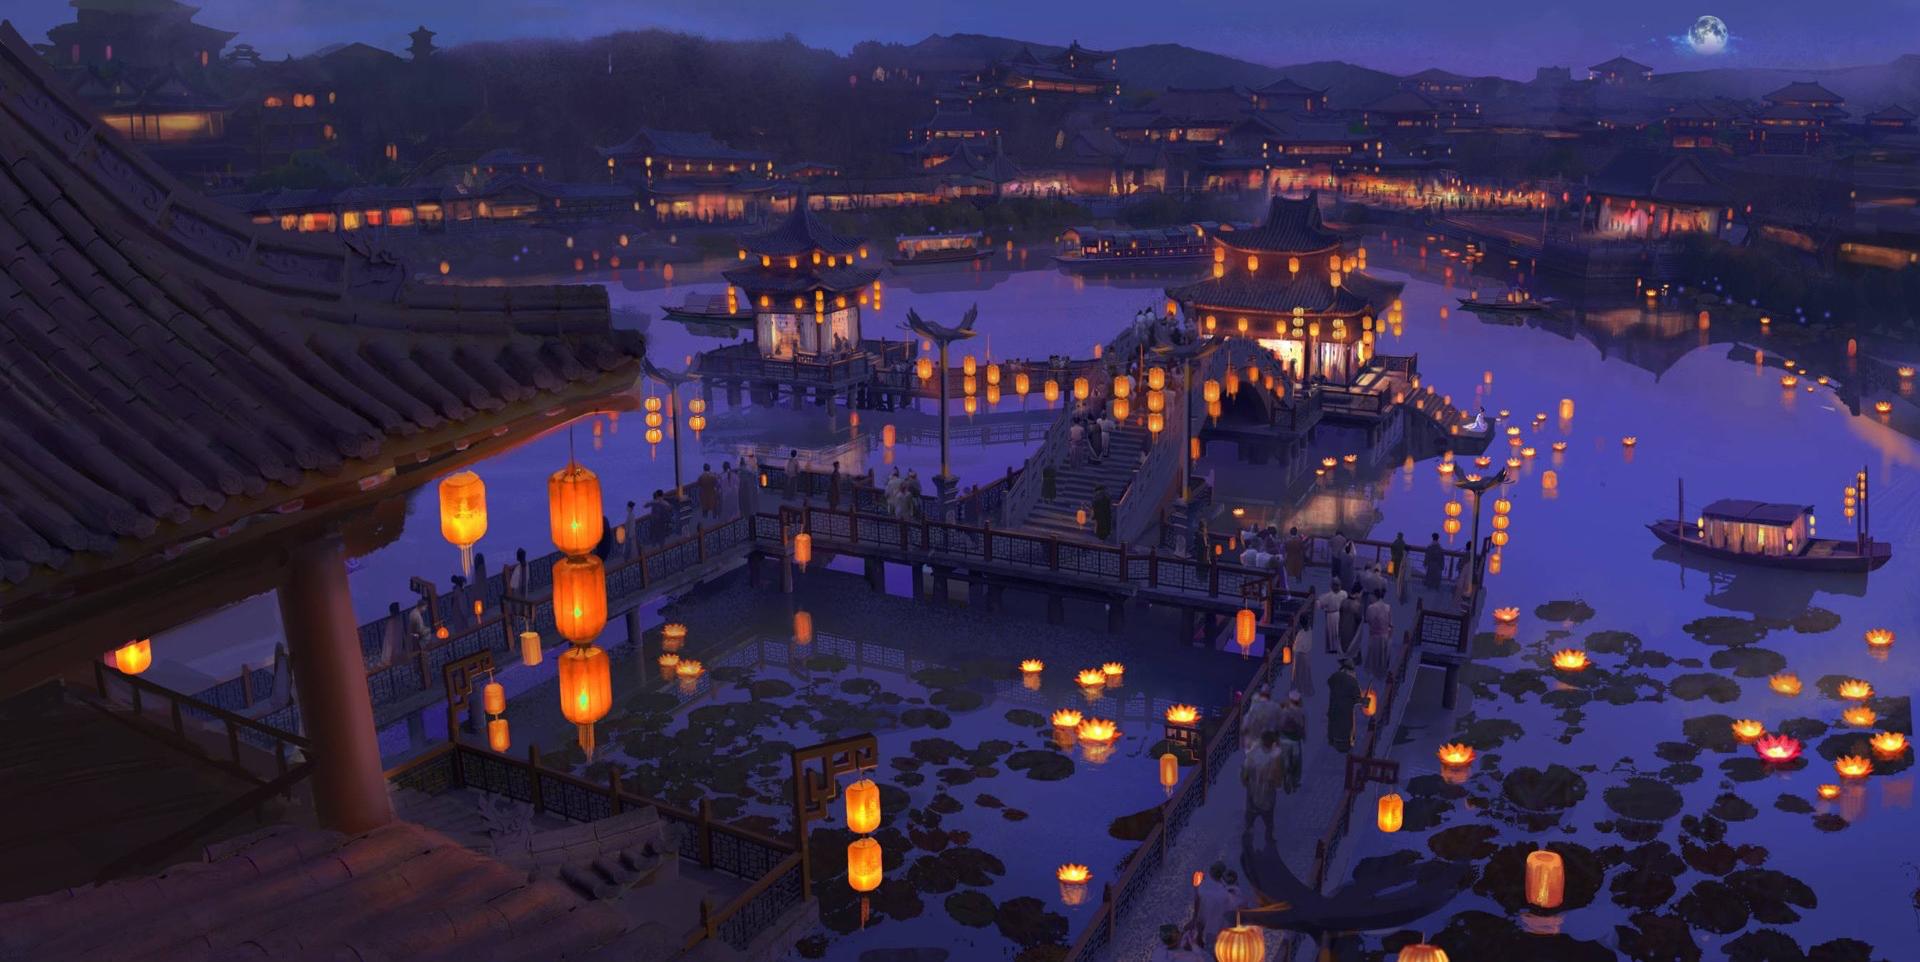 https://www.corchaosis.ru/img/Town/China/Night-Lantern!-by-YangWang.png